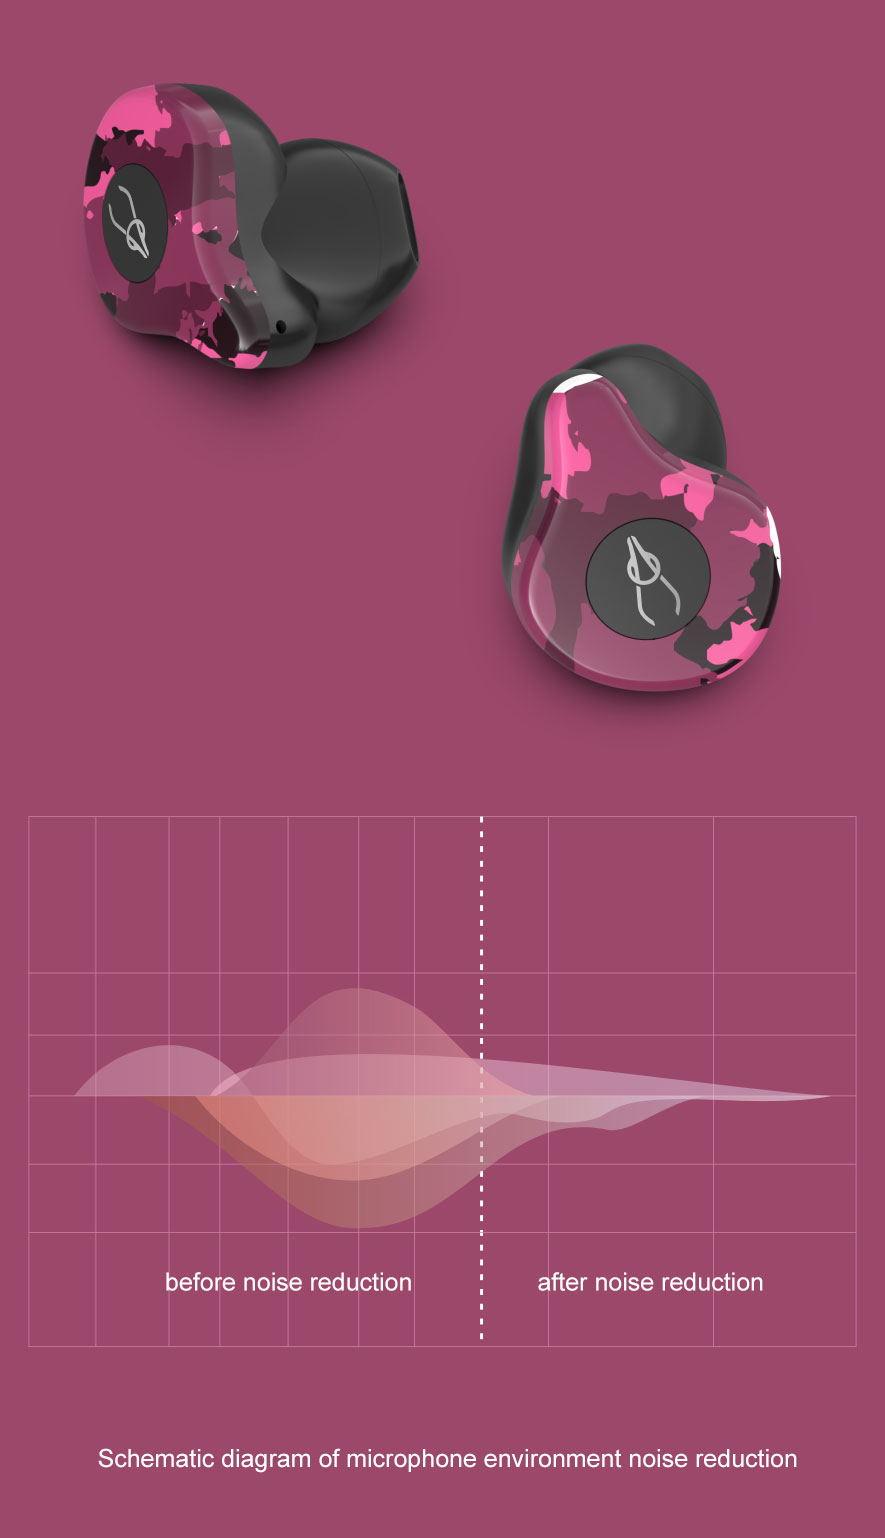 new sabbat x12 ultra earbuds